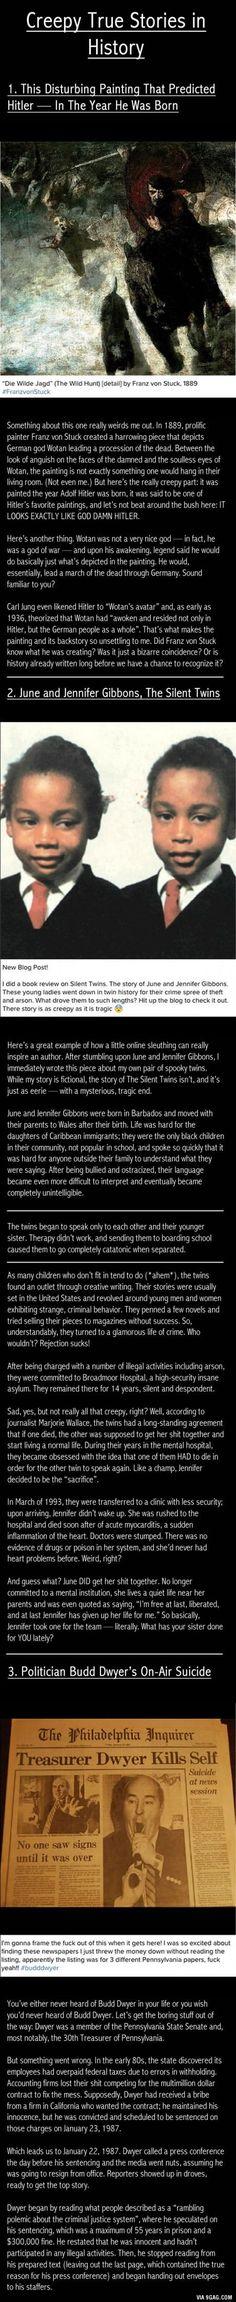 Creepy Stories in History